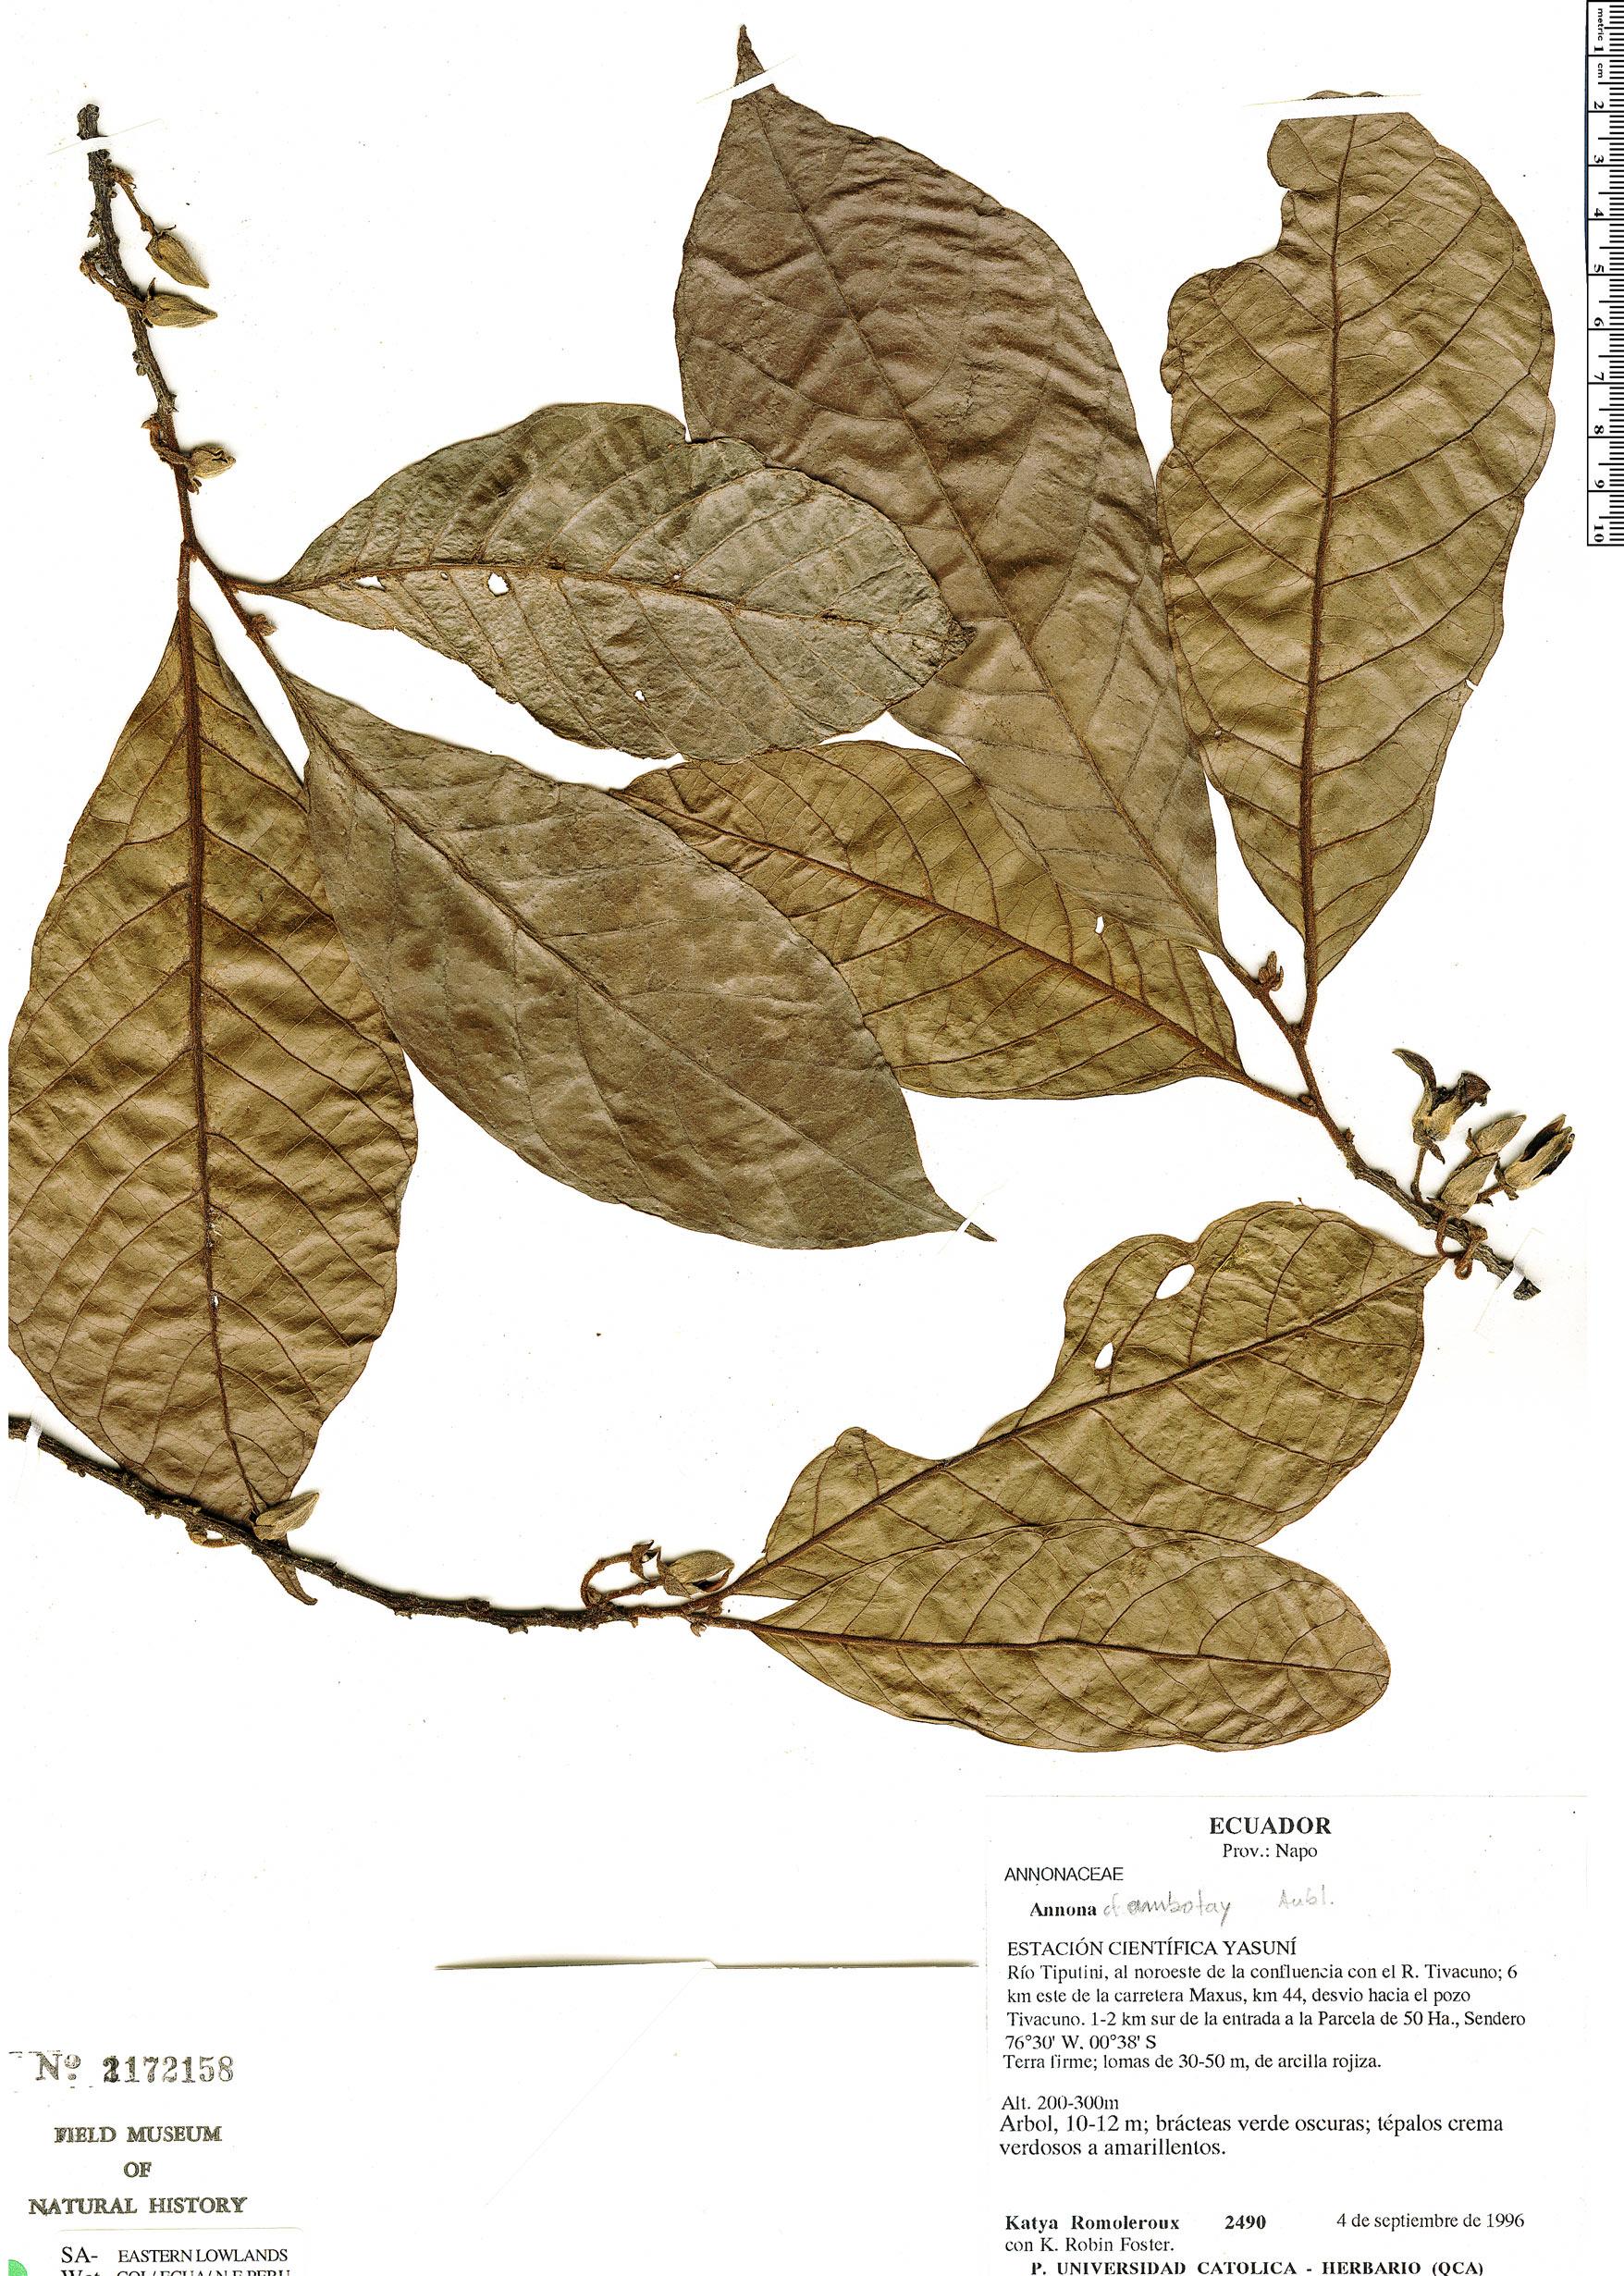 Specimen: Annona ambotay